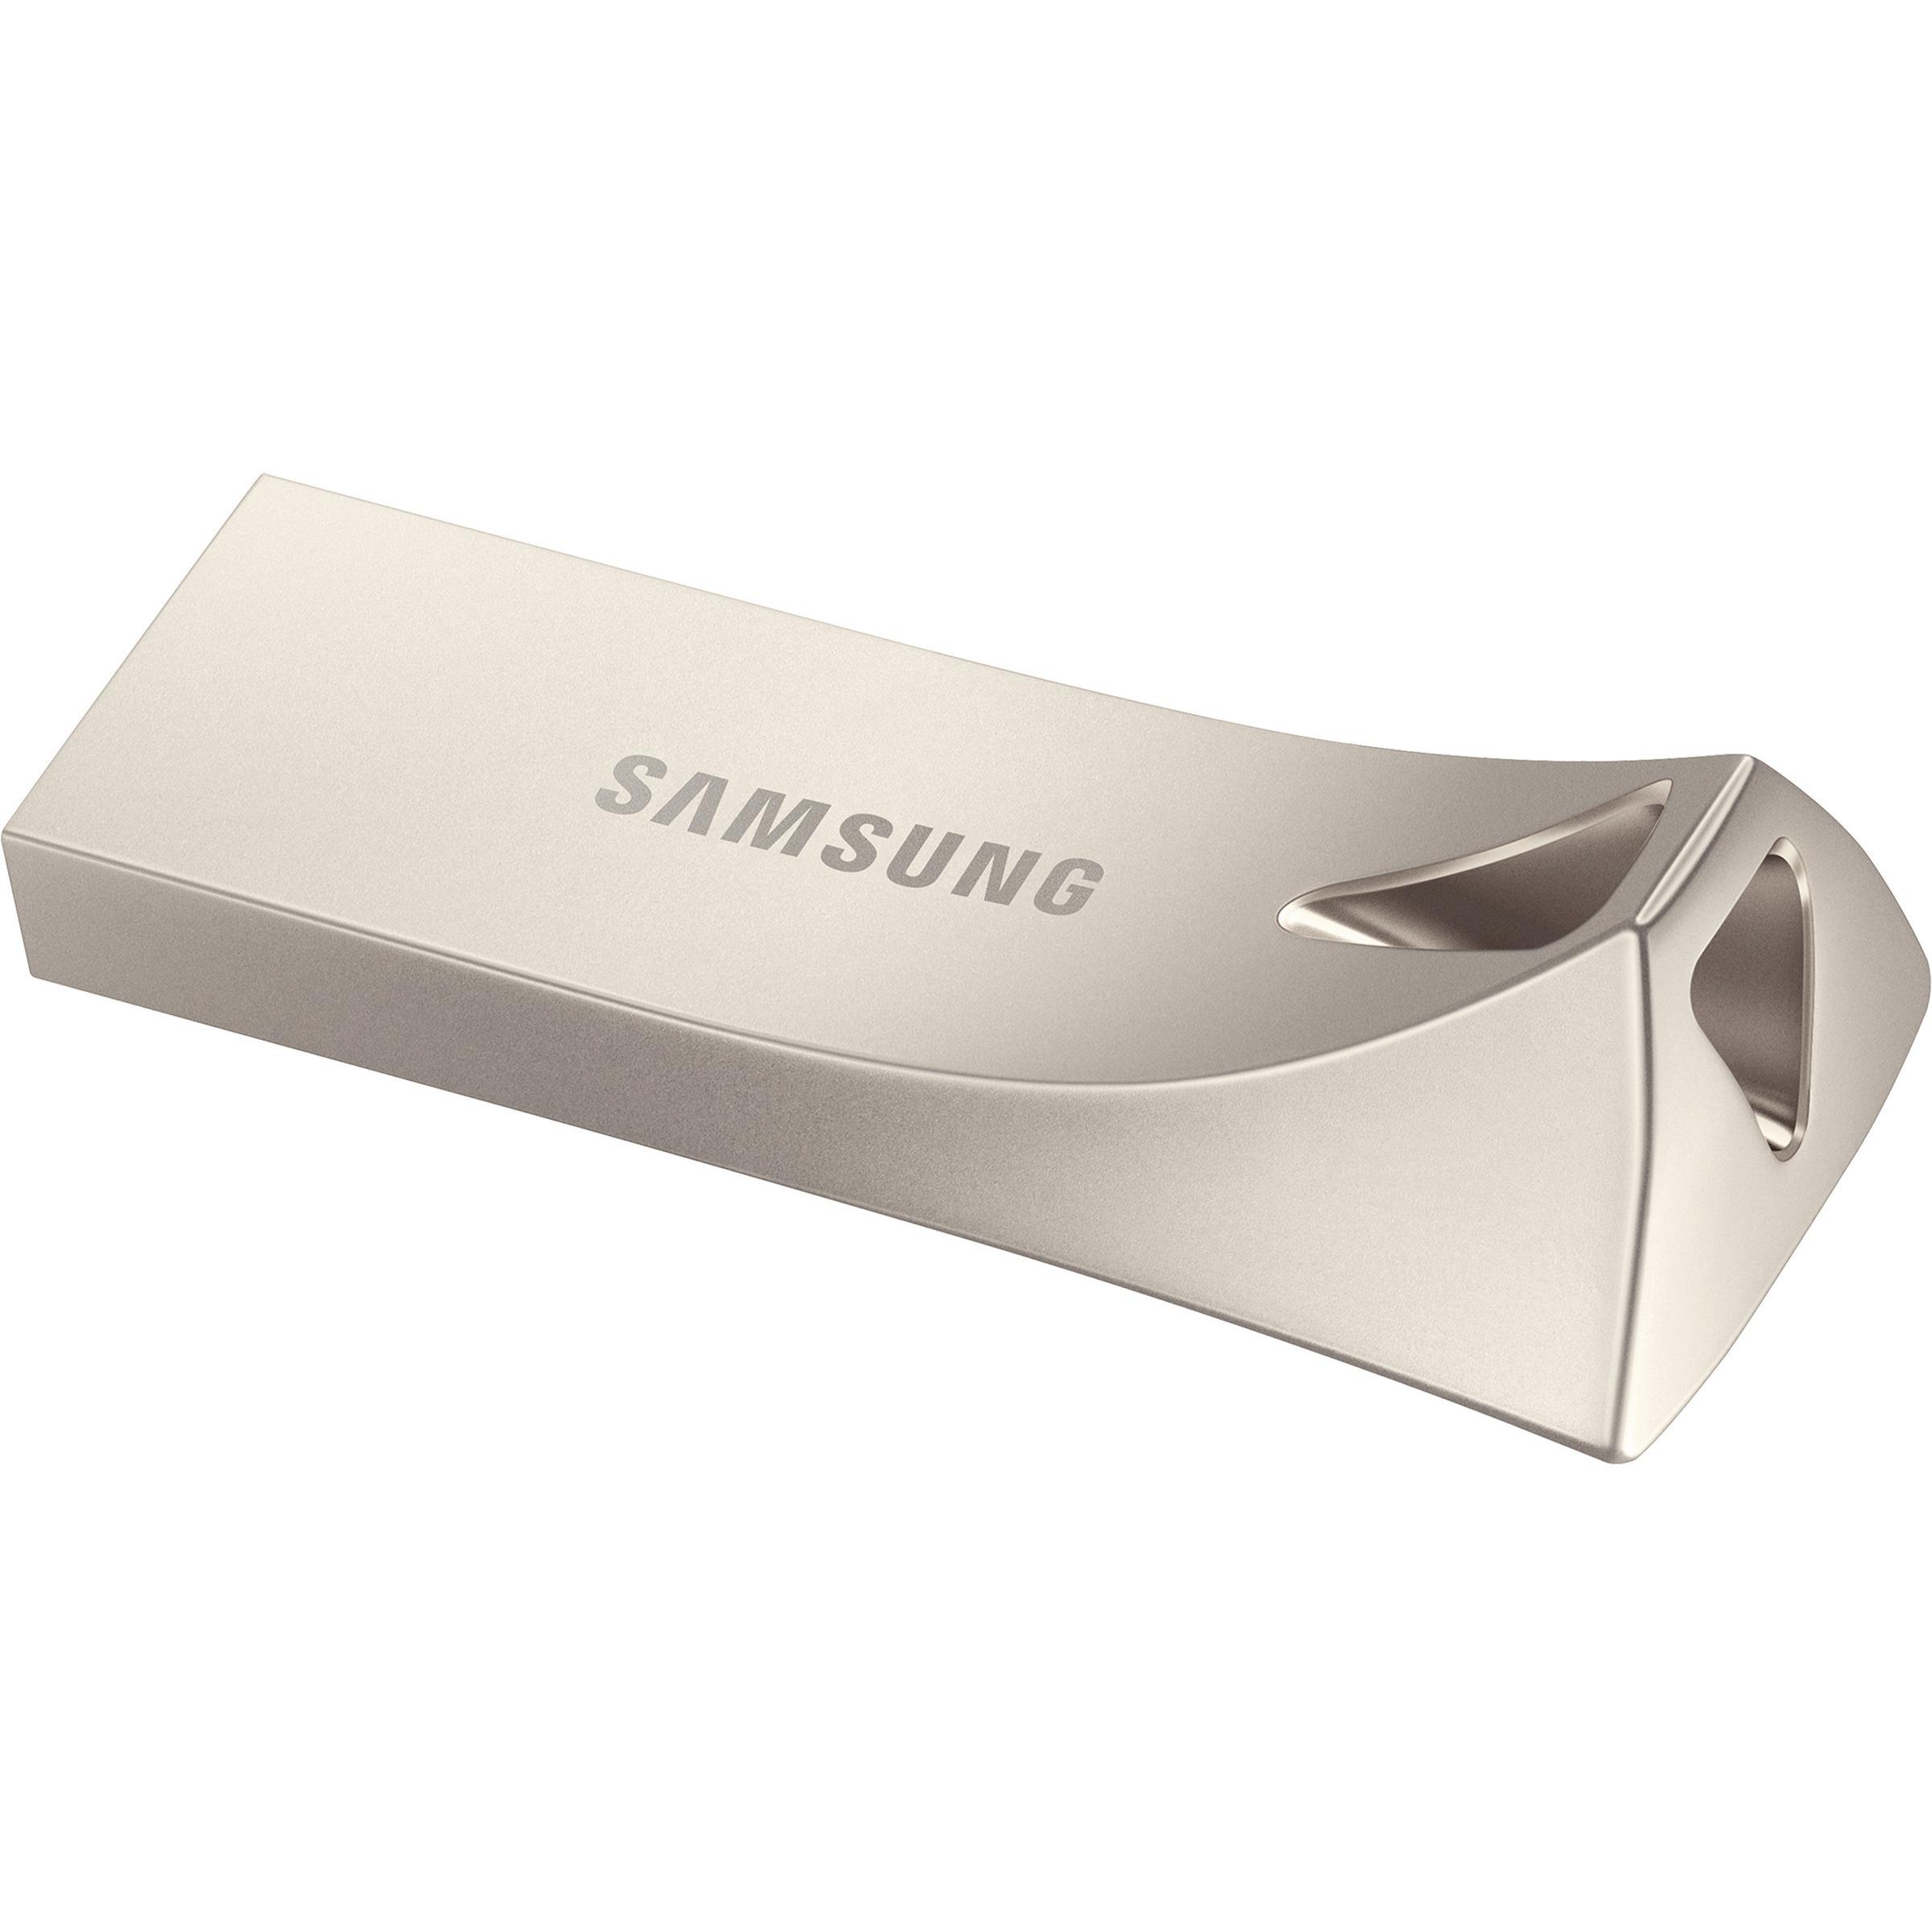 Samsung BAR Plus 128 GB USB 3.1 Type A Flash Drive - Champagne Silver